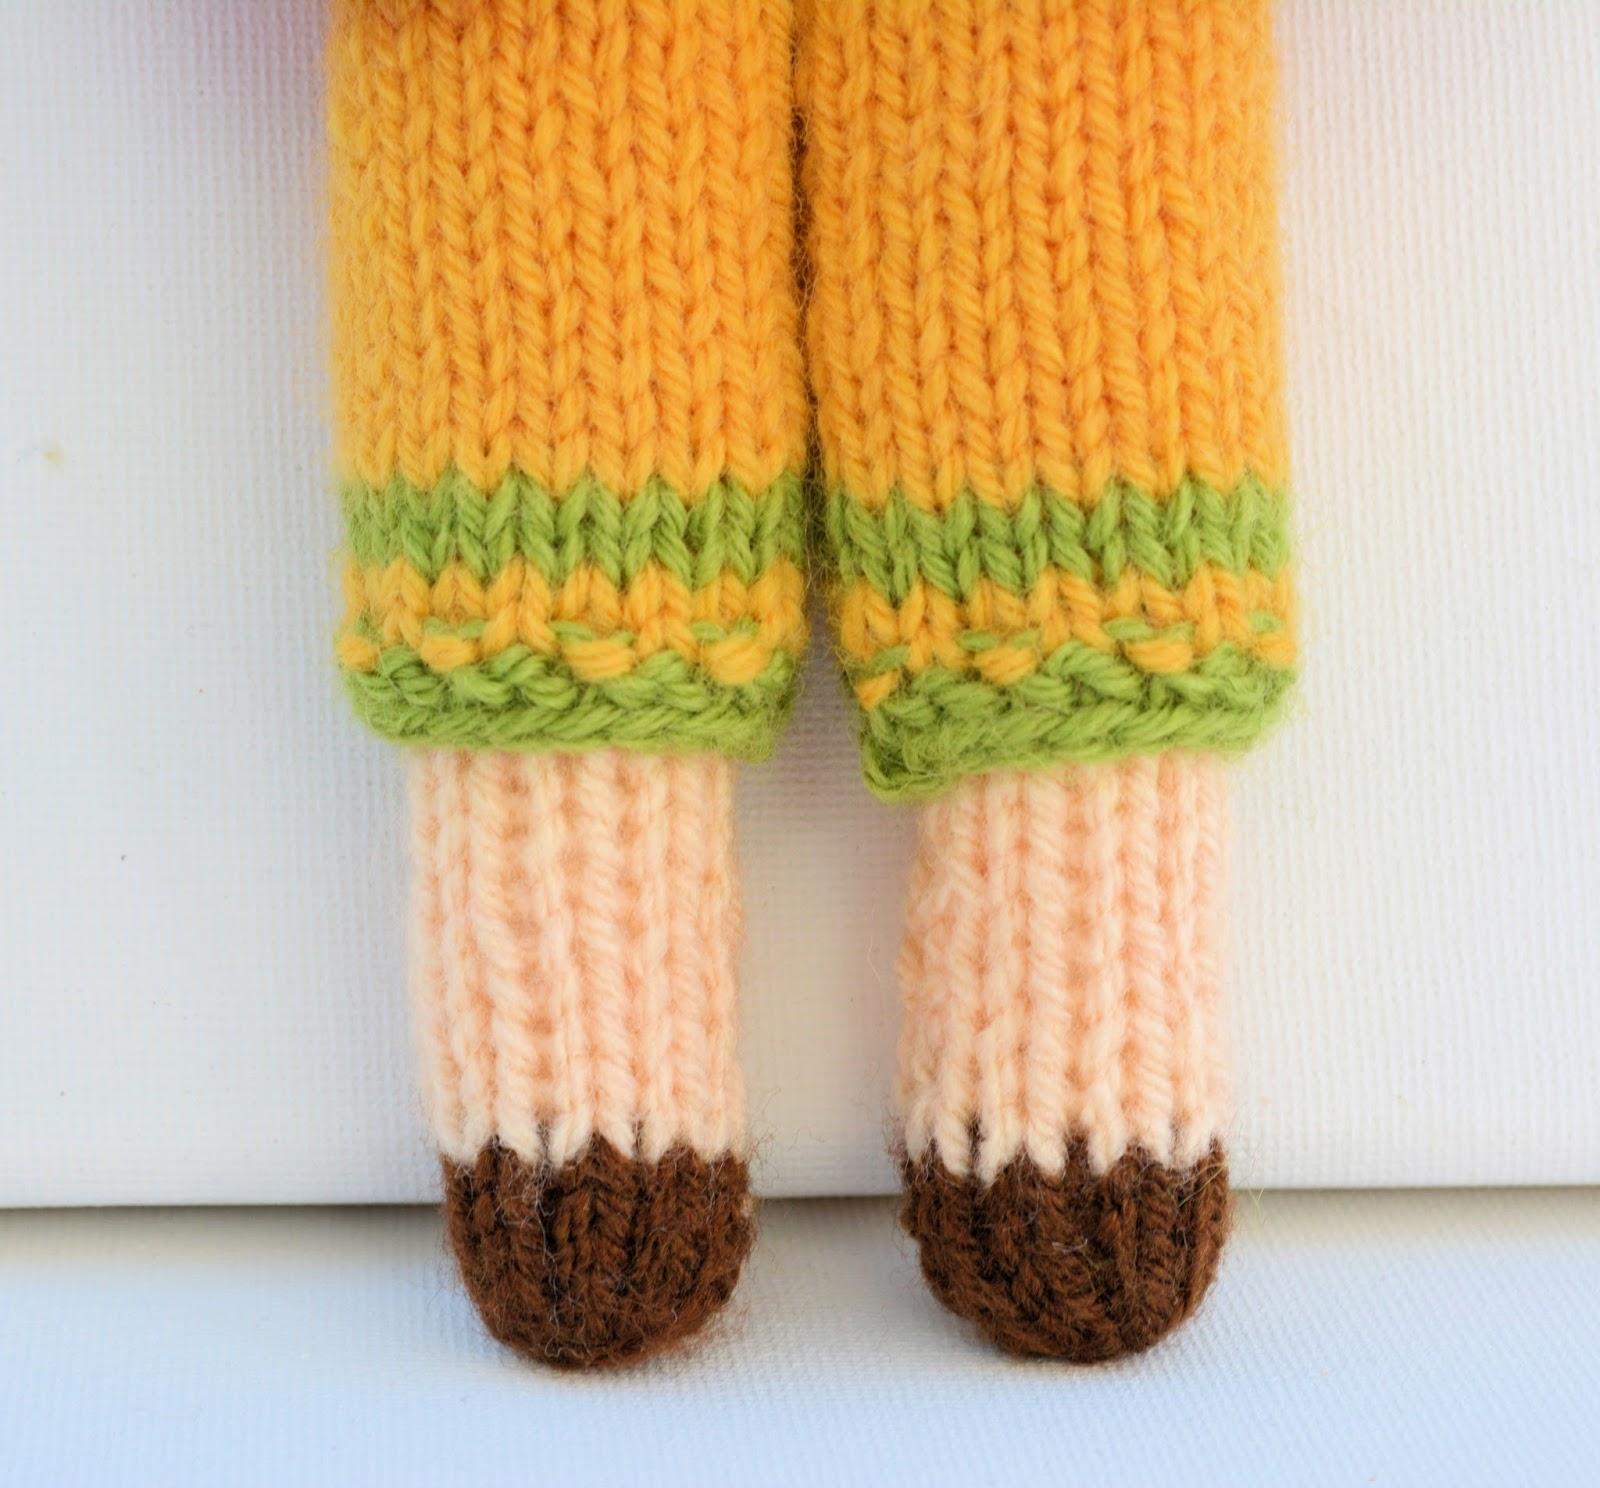 Daisy Doll Knitting Pattern : Edith Grace Designs: Daisy Rag Doll Knitting Pattern